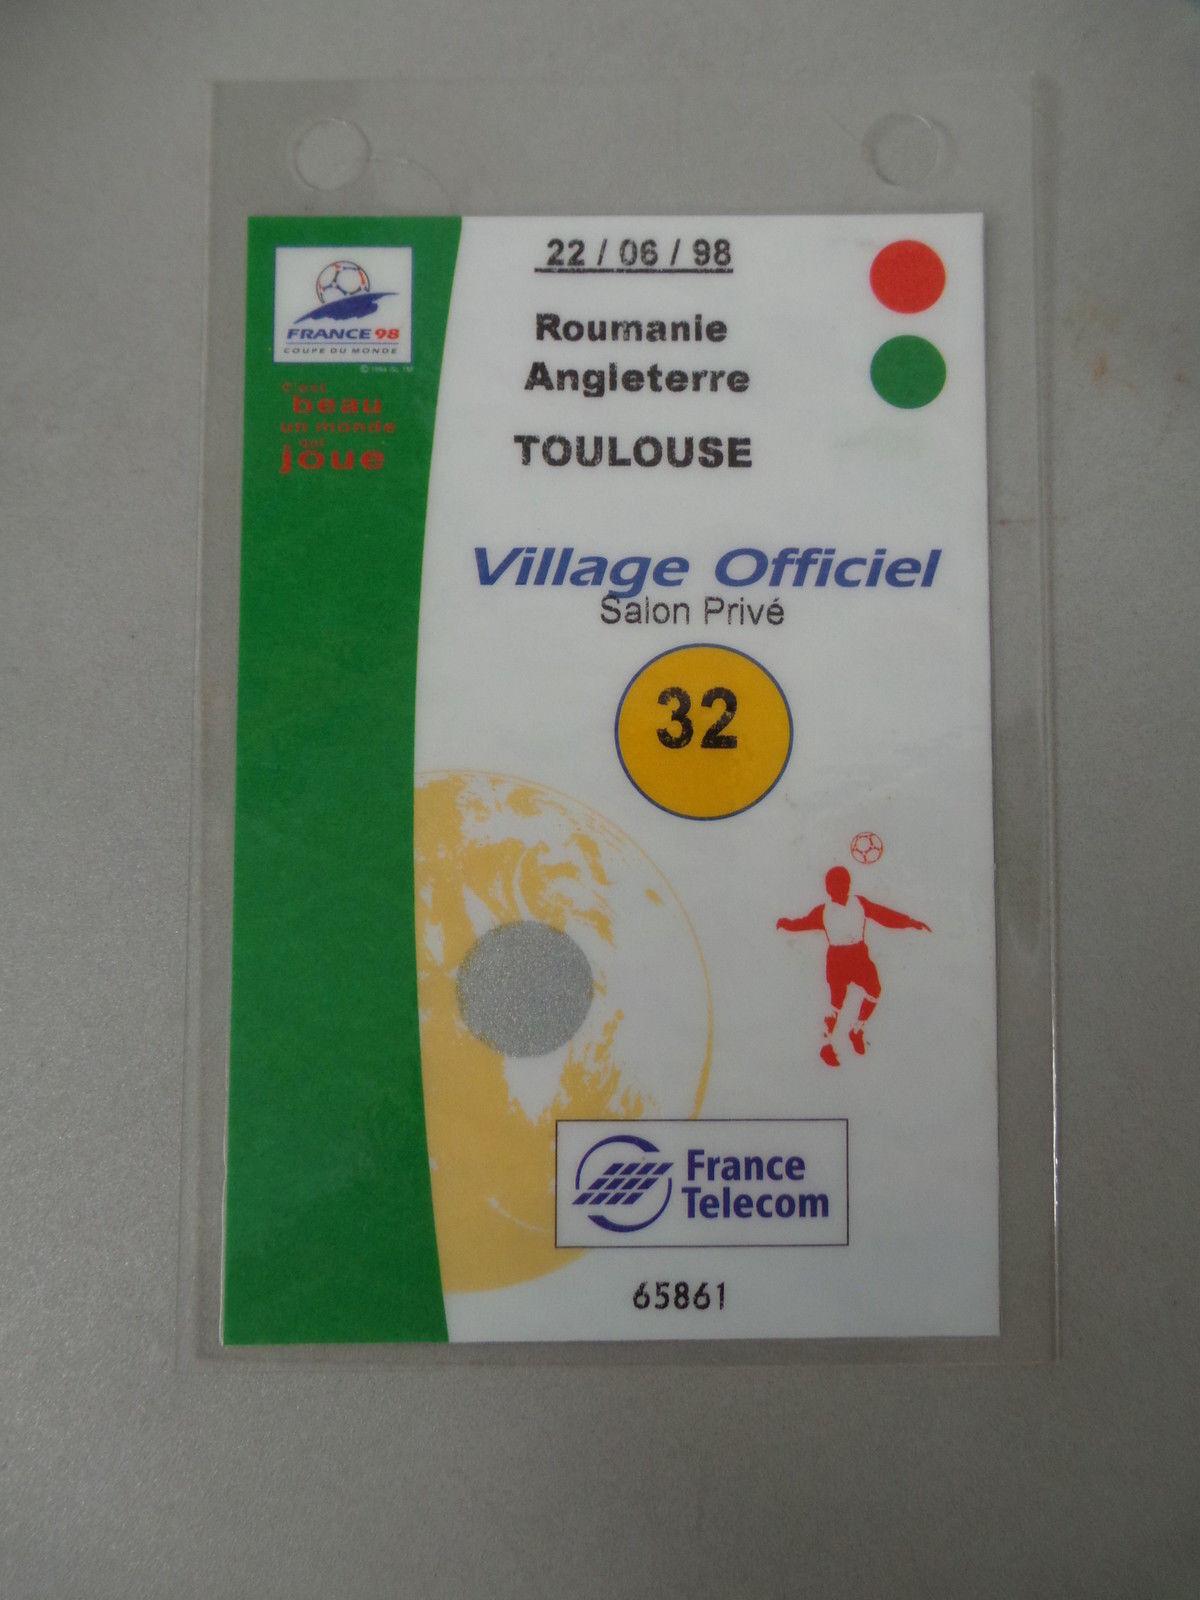 TICKET TICKET TICKET LAISSER PASSER FOOTBALL 1998 COUPE DU MONDE VILLAGE OFFICIEL ROUM ANGL b85610